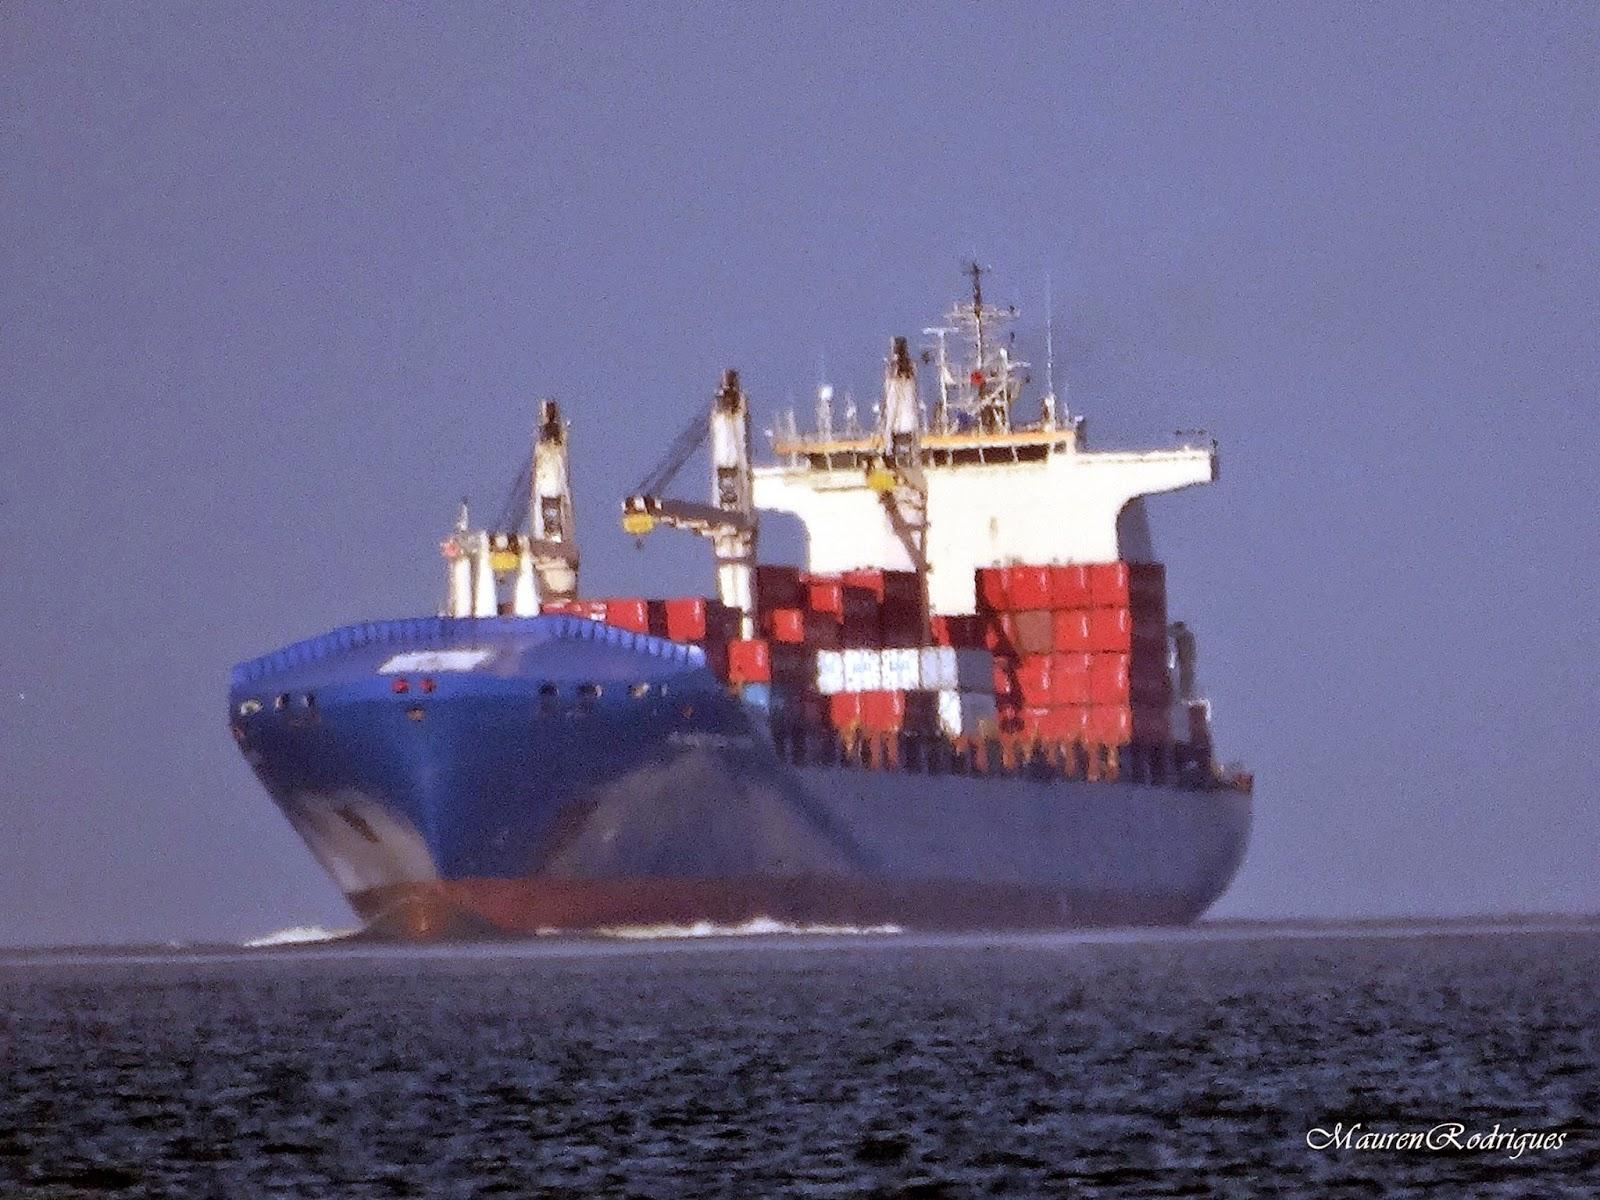 Navio entrando no porto de Rio Grande